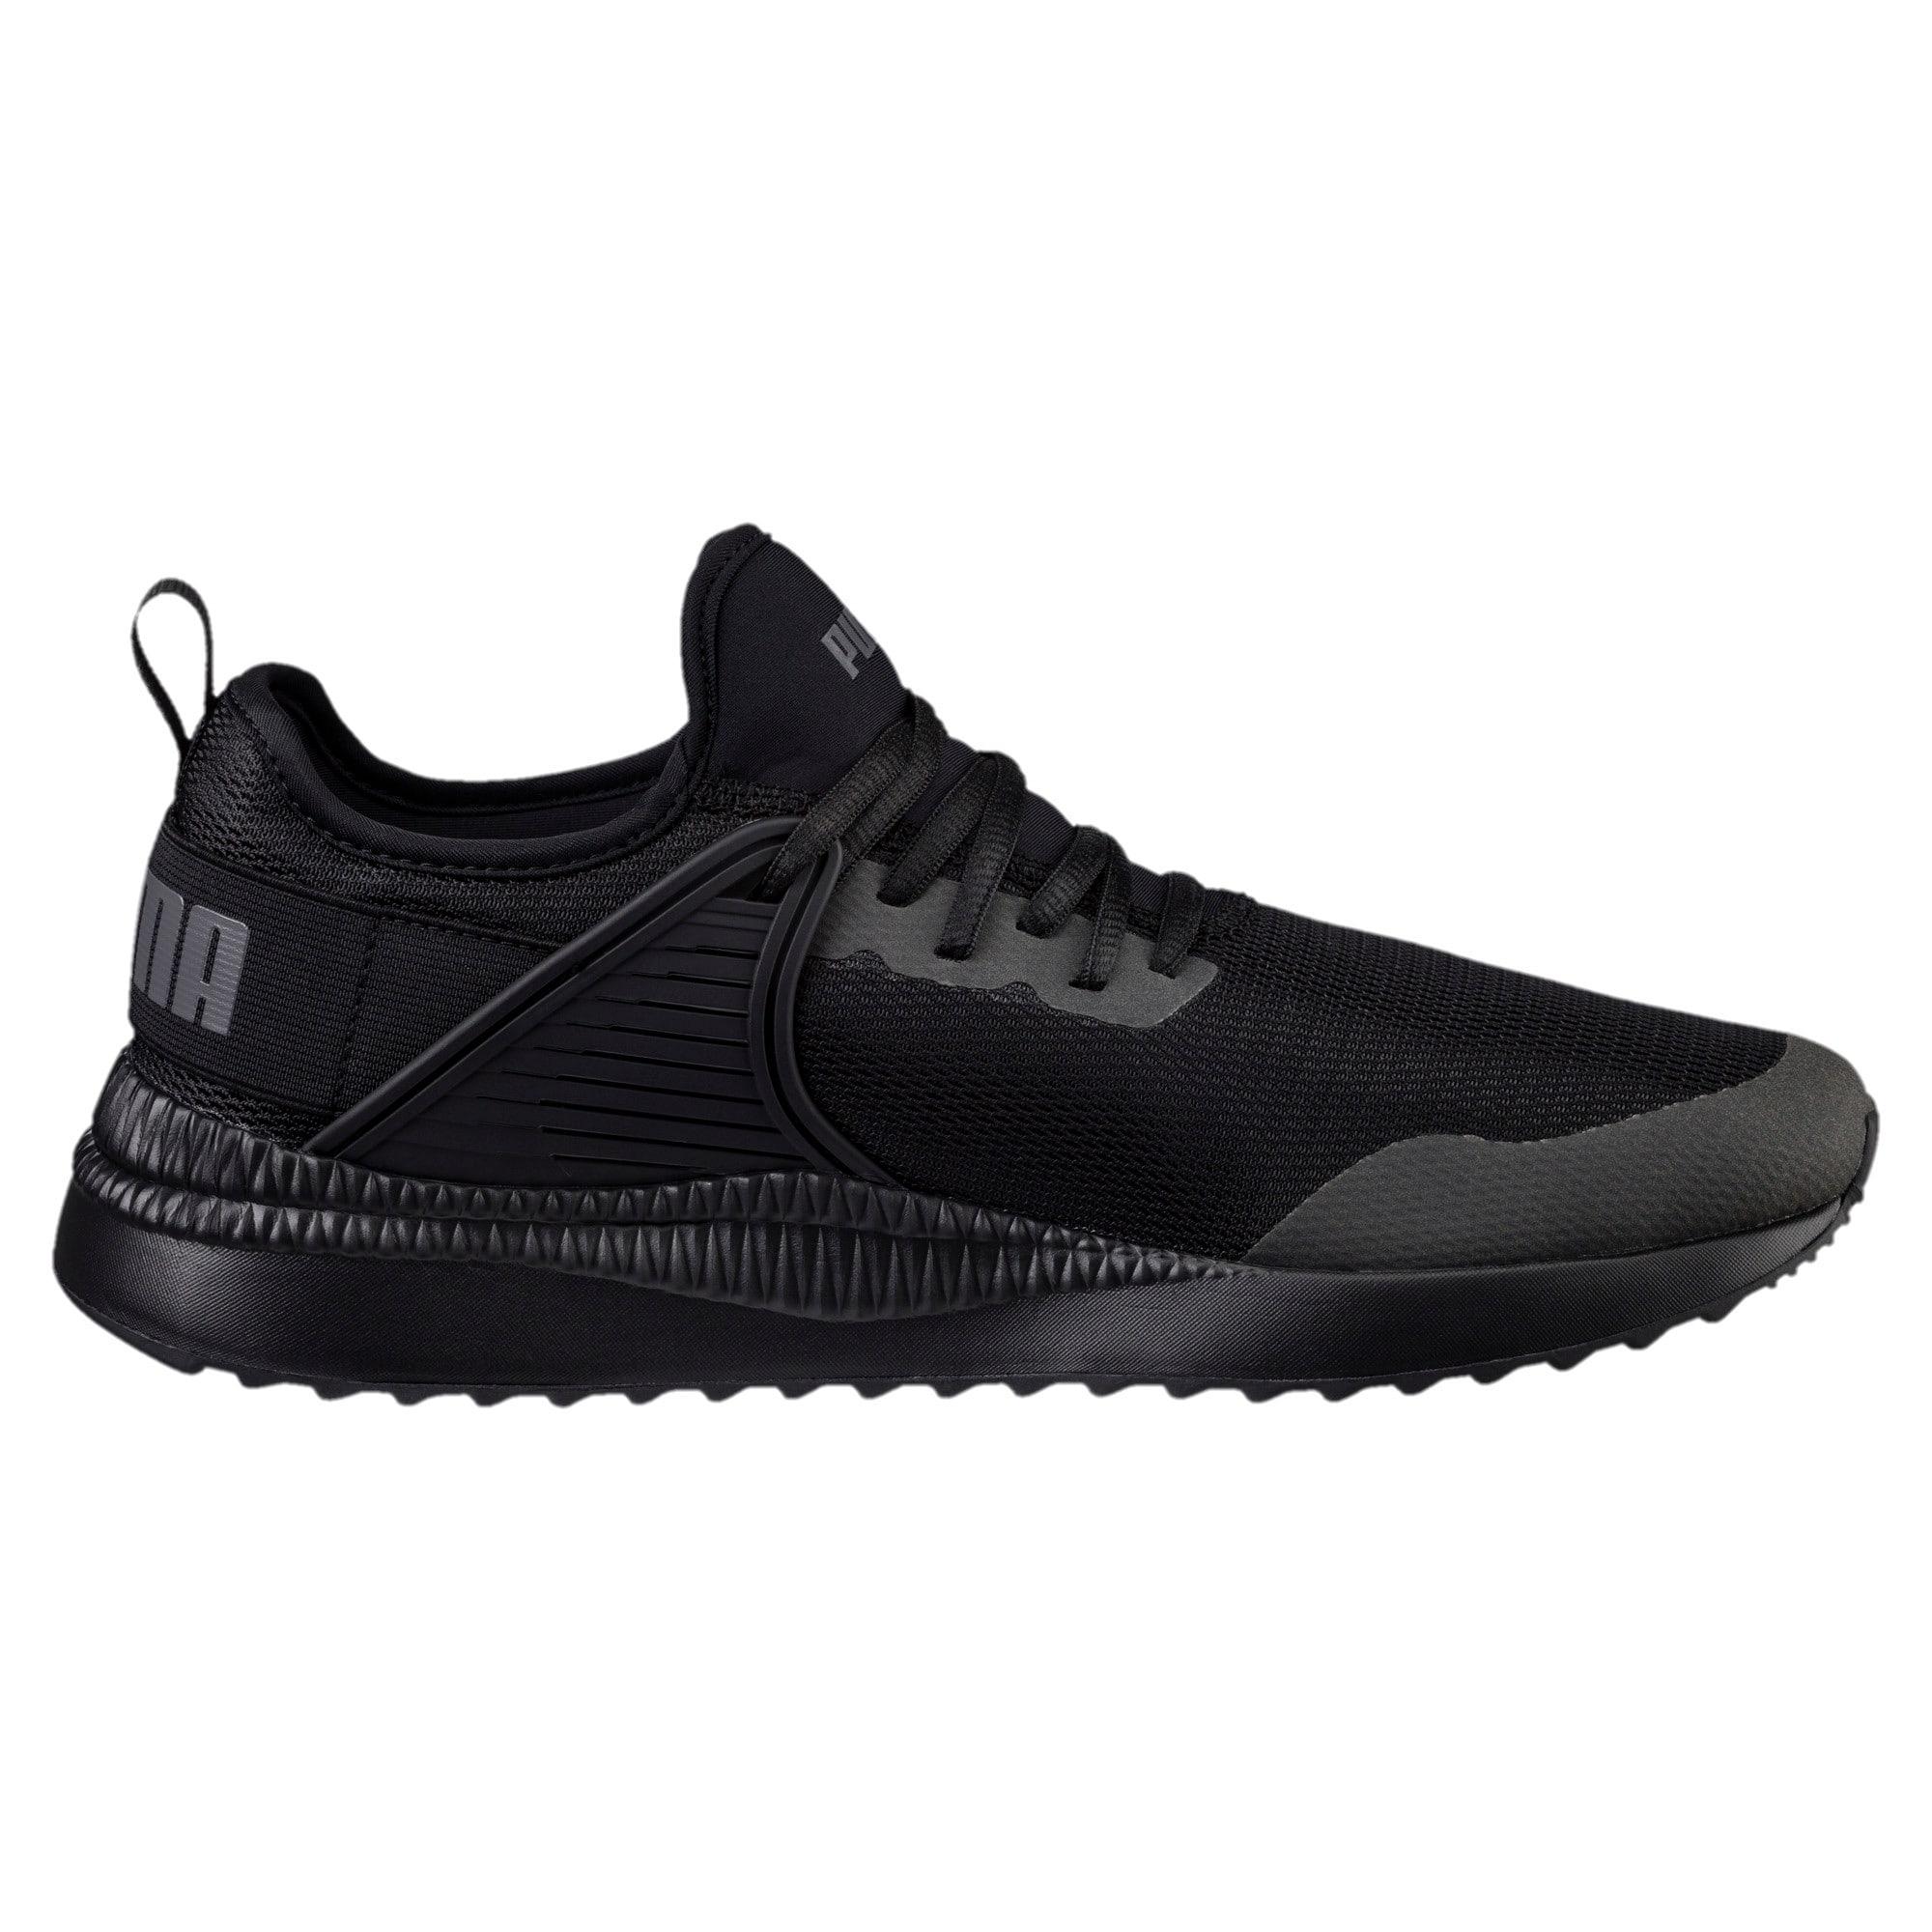 Thumbnail 3 of Pacer Next Cage Sneakers, Puma Black-Puma Black, medium